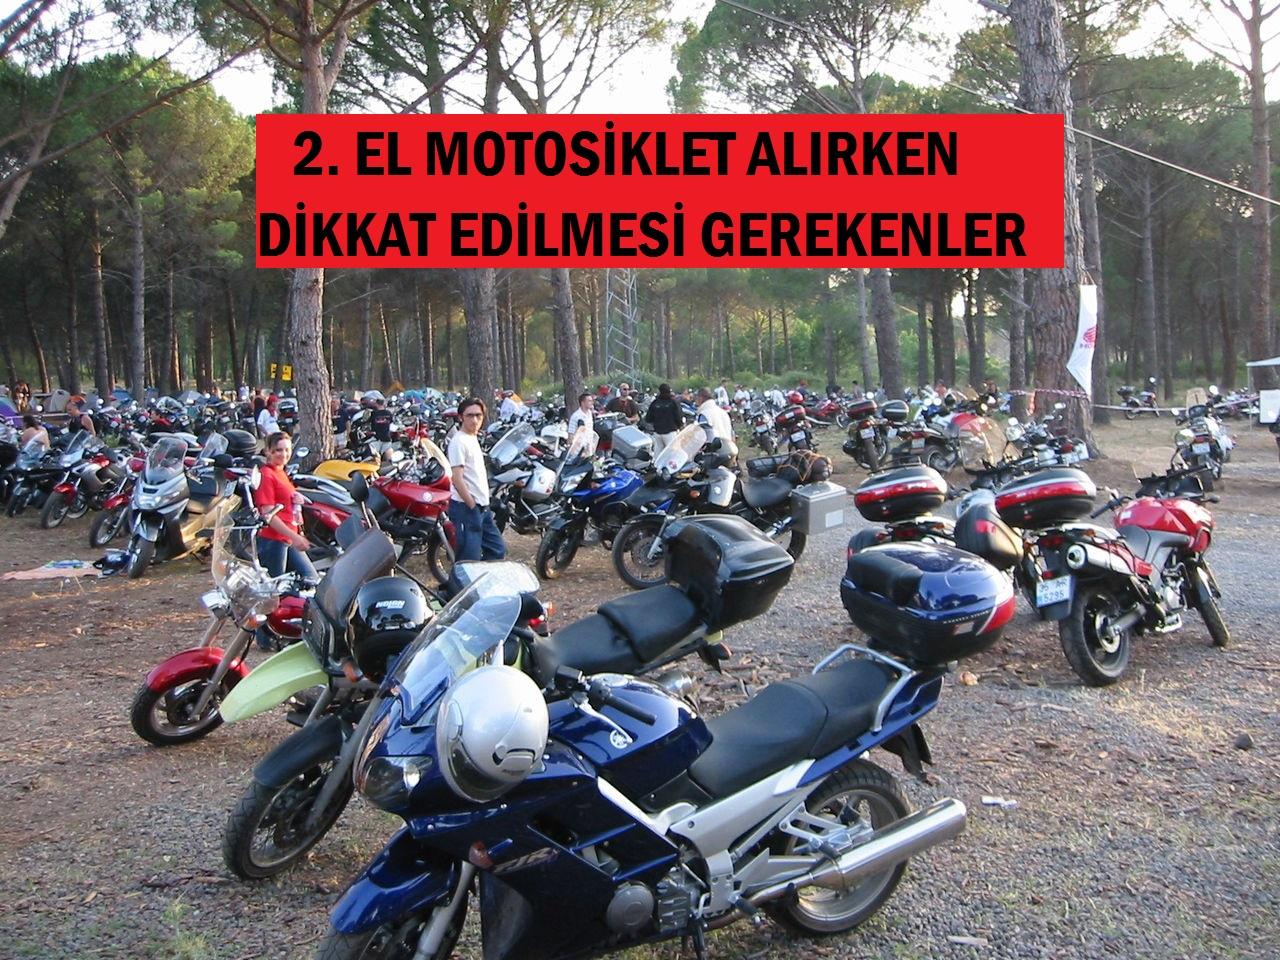 2. el motosiklet alırken nelere dikkat edilmeli